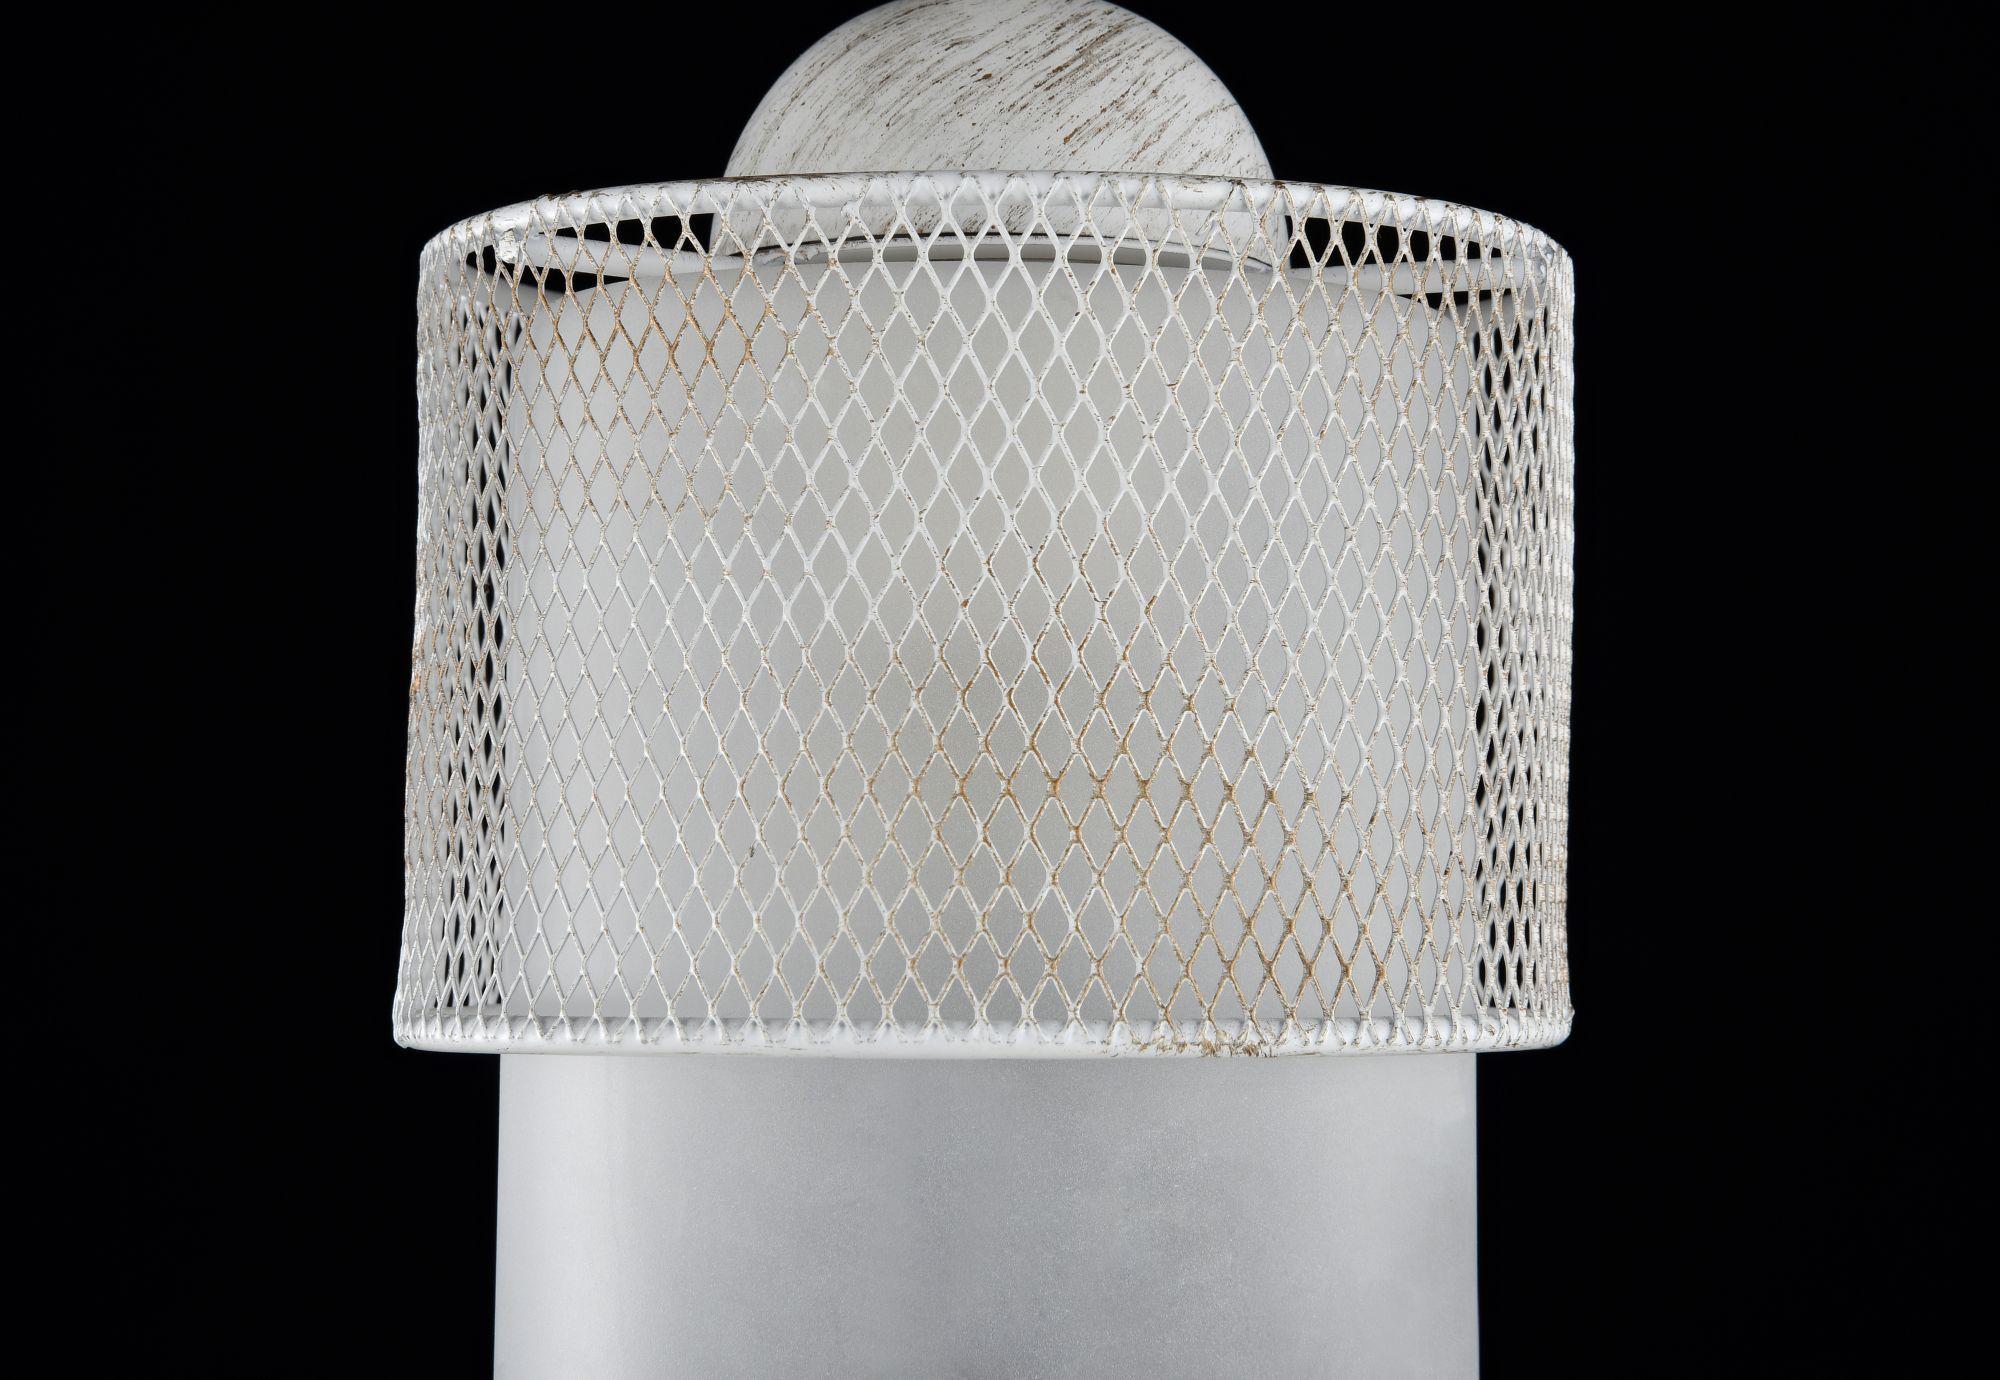 Подвесной светильник Freya Ornella FR2201-PL-01-WG (fr201-11-w), 1xE27x60W, белый, металл, металл со стеклом/пластиком - фото 5